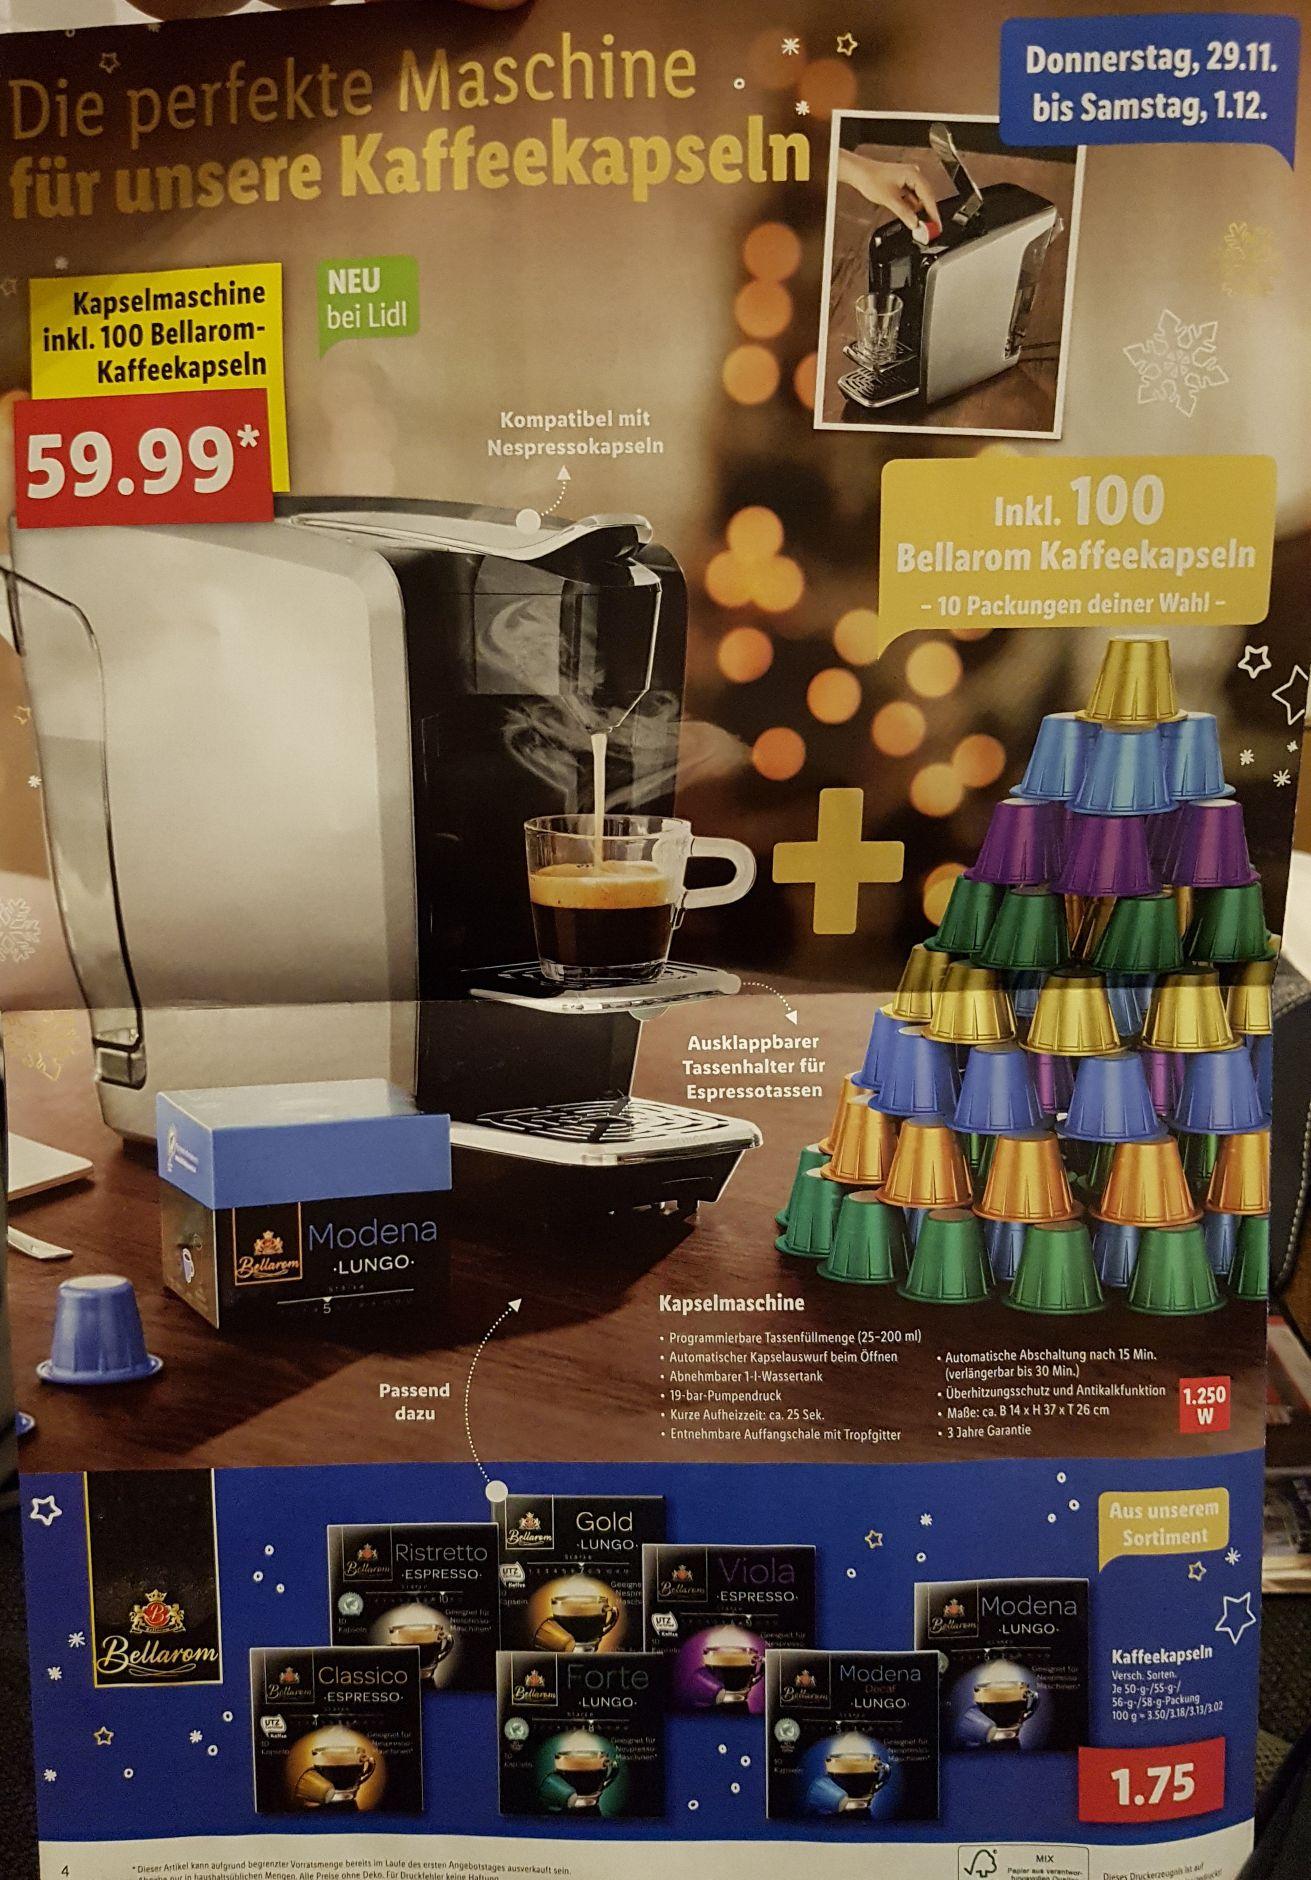 [LiDL lokal] Kapselmaschine + 100 Bellarom Kaffekapseln